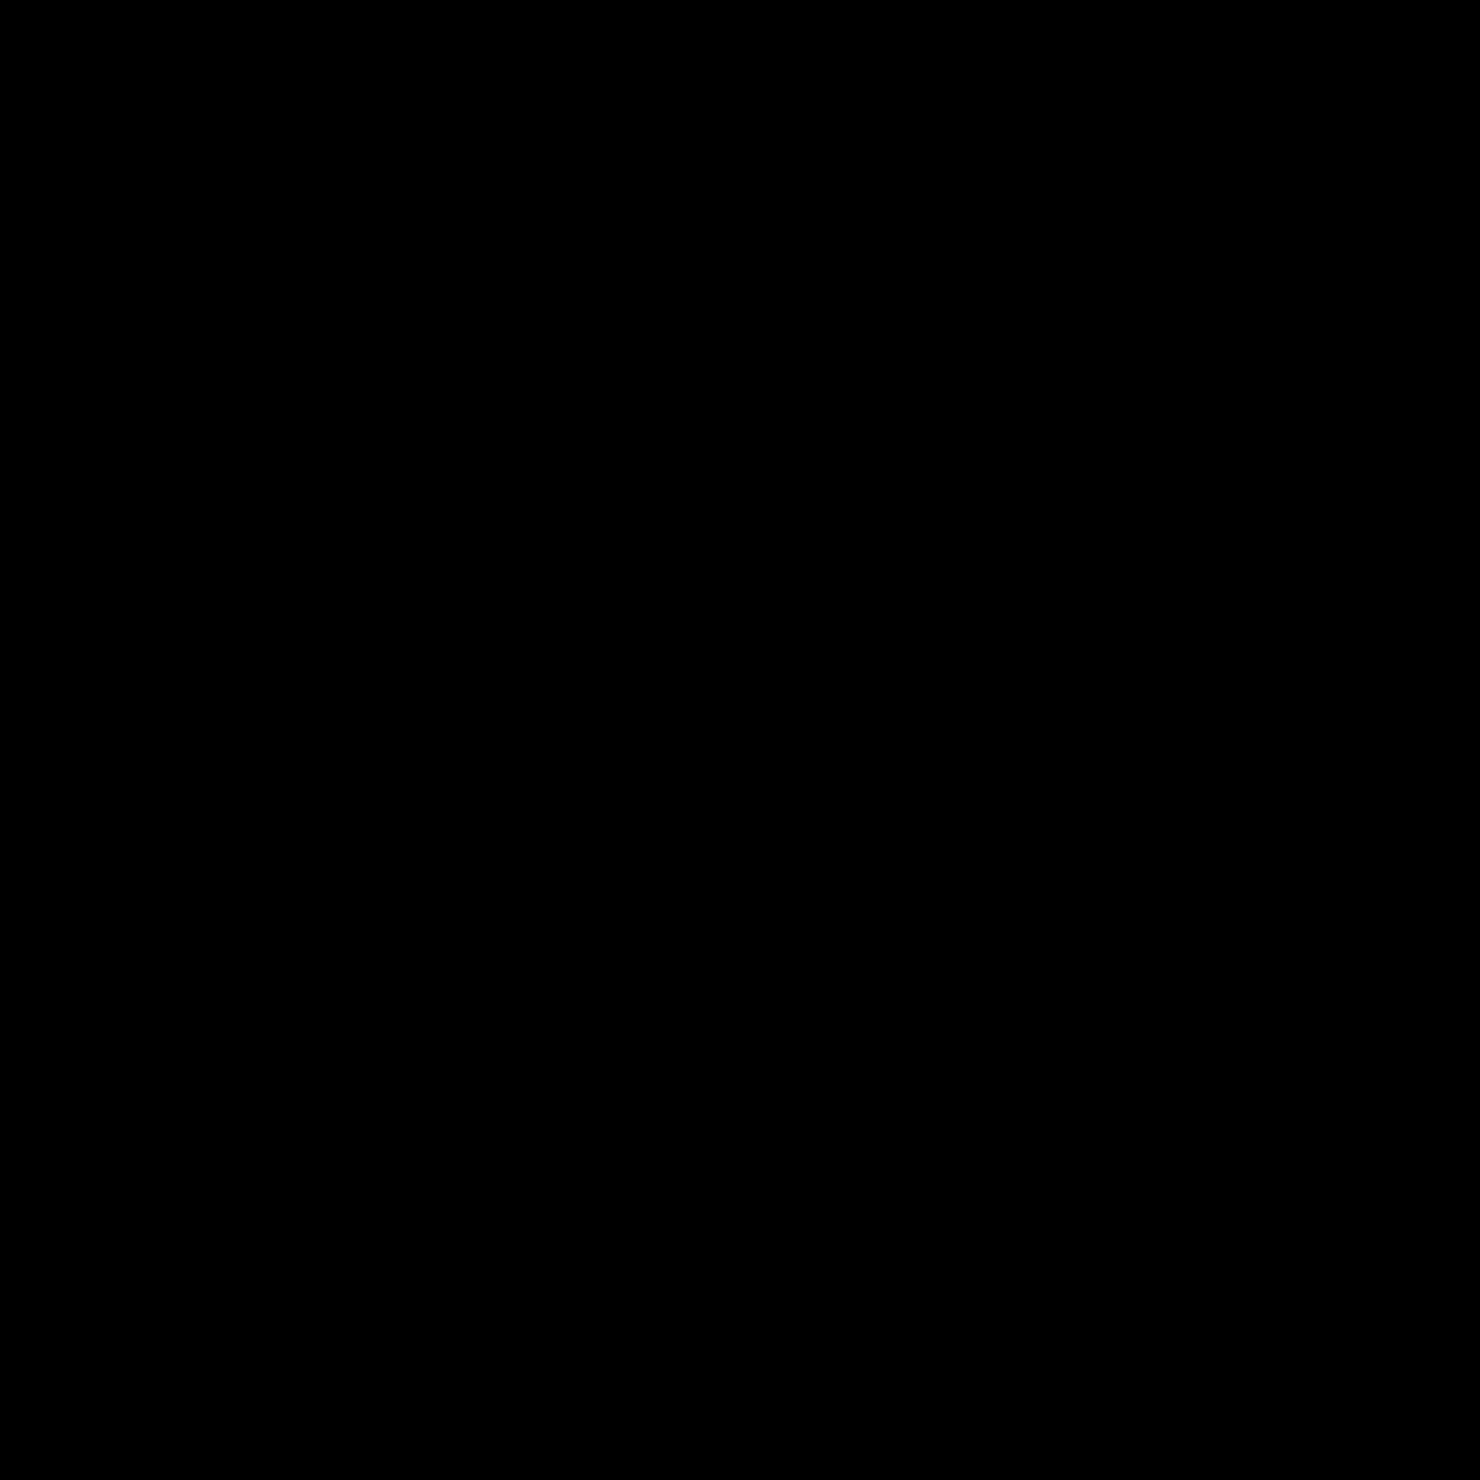 T.tsubasa さま ロゴ